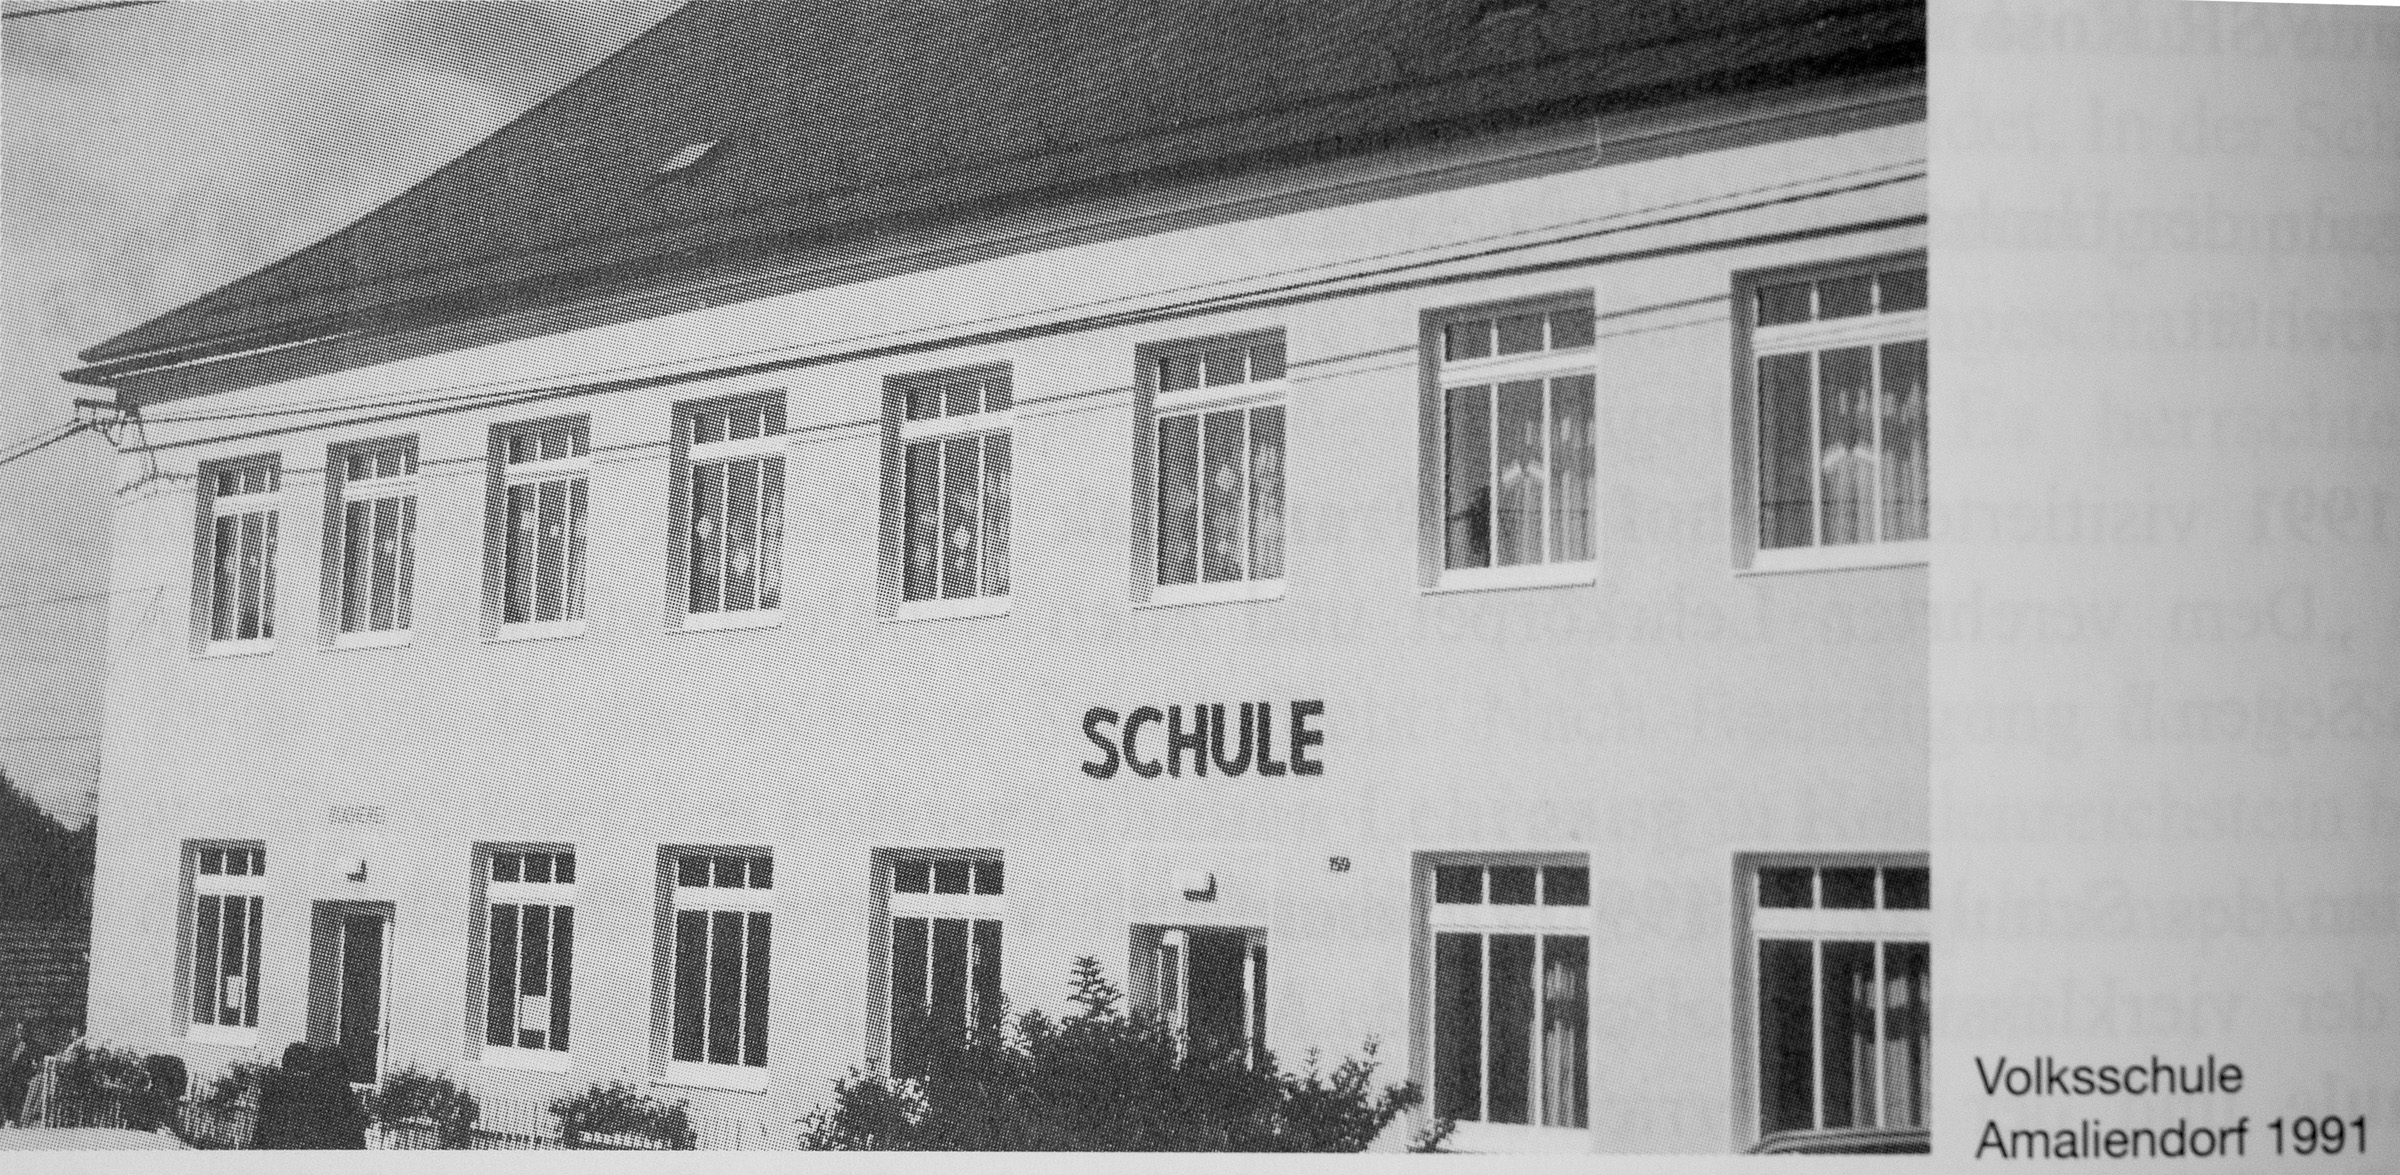 Volksschule Amaliendorf 1991.jpg